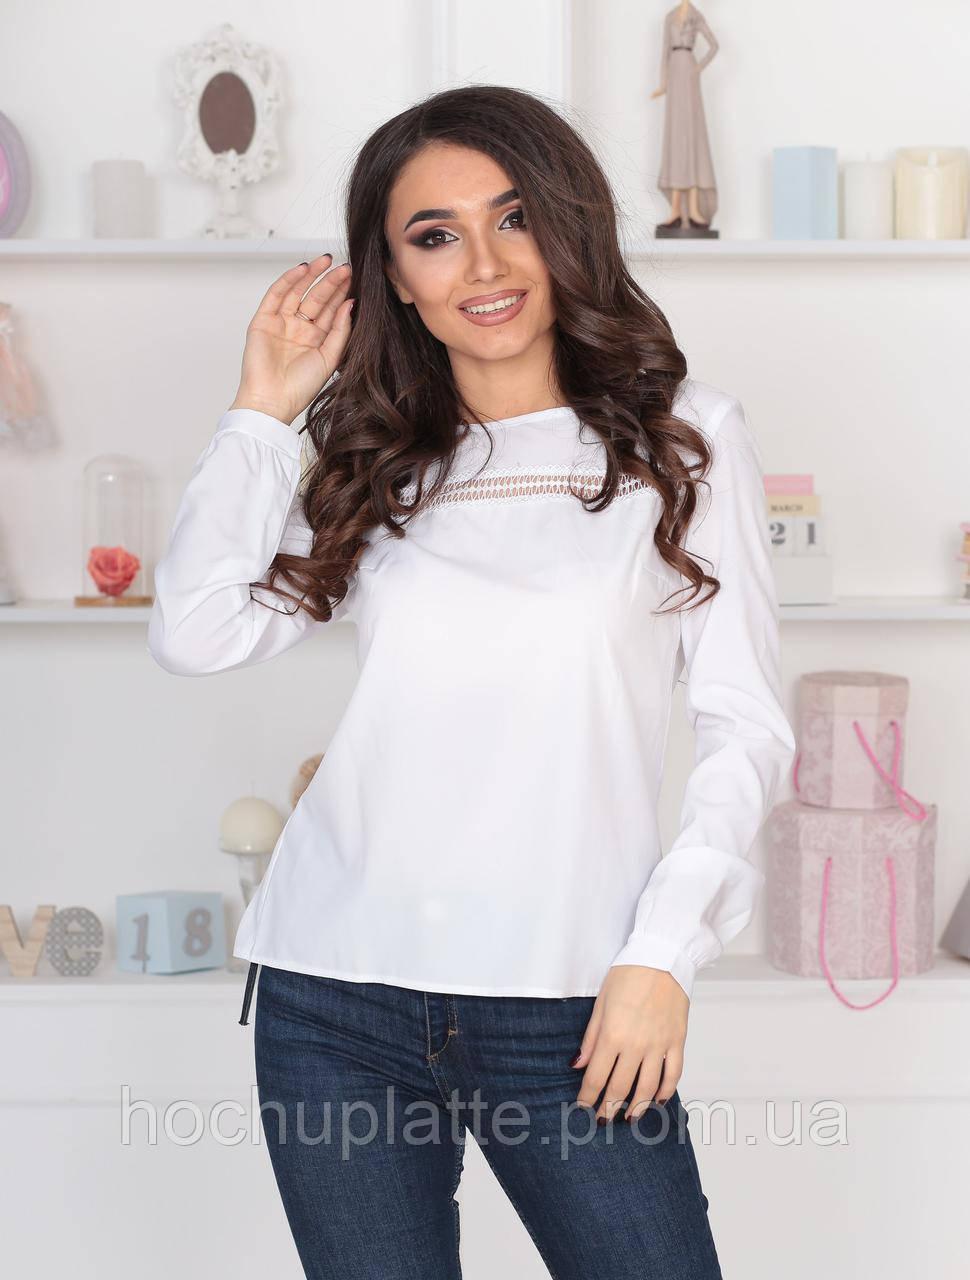 95e7bae4e02 Блузка с кружевными вставками  продажа